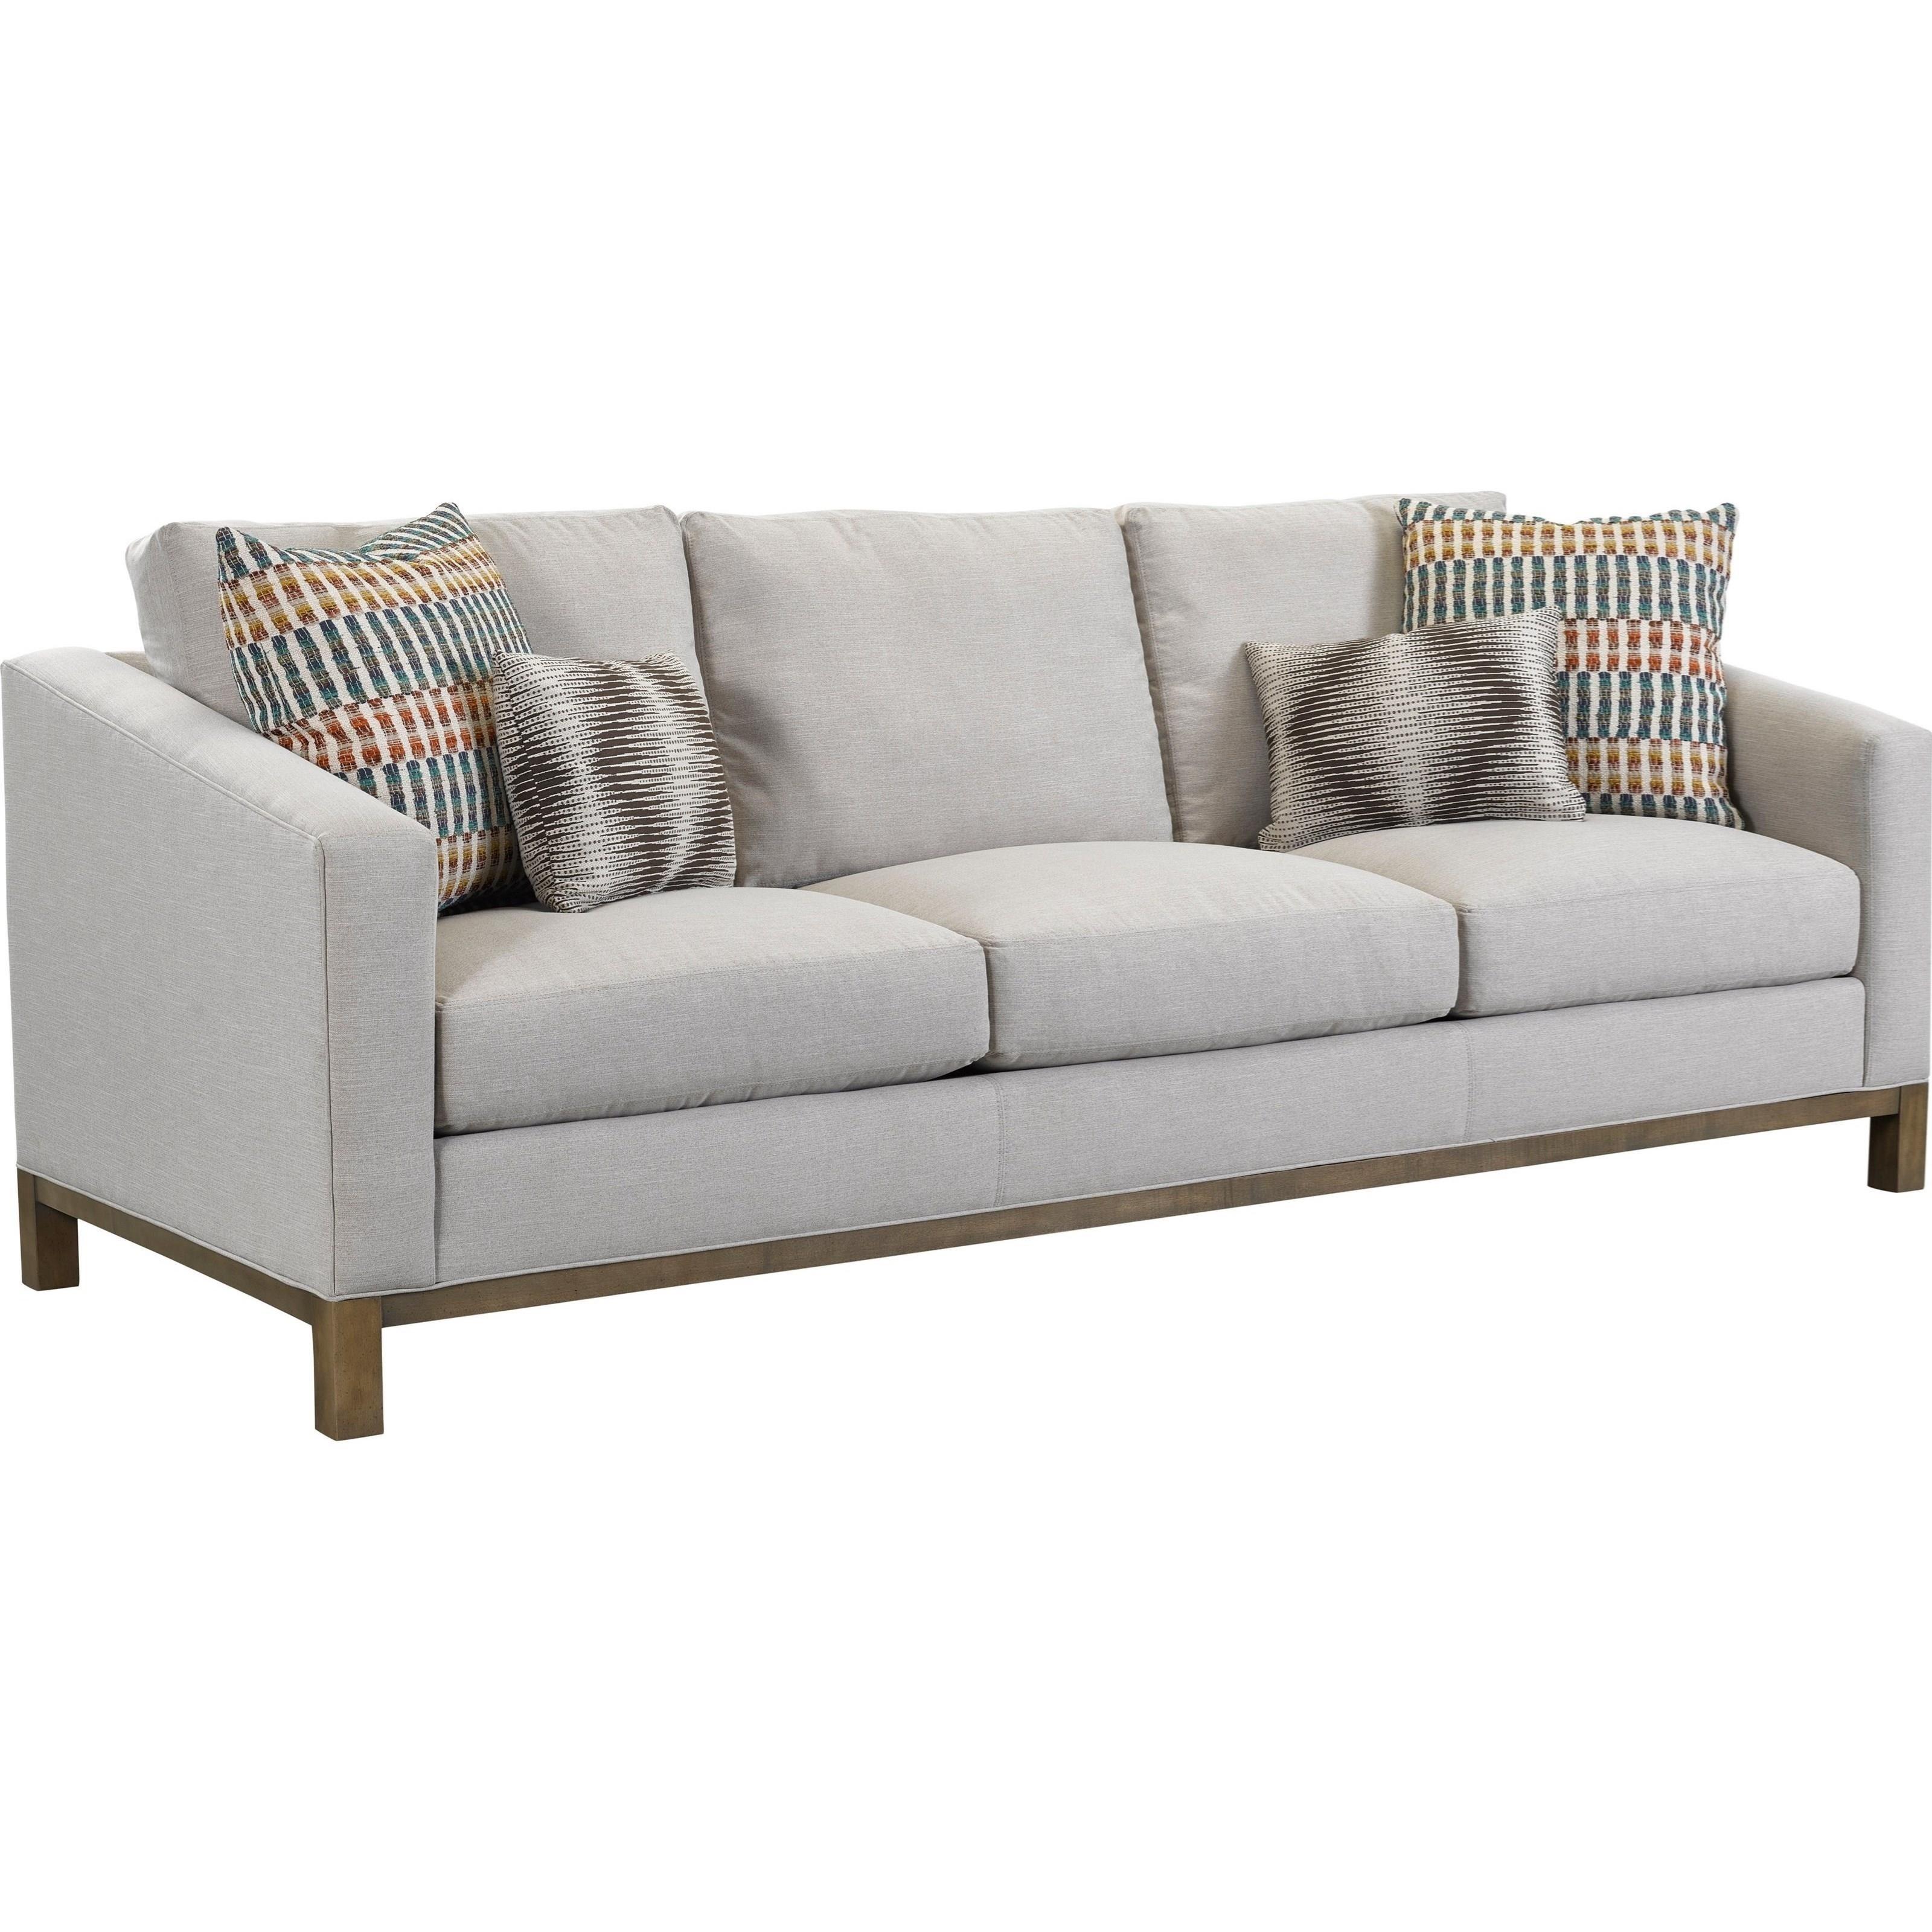 Broyhill Furniture Sundance Sofa Item Number 4307 300